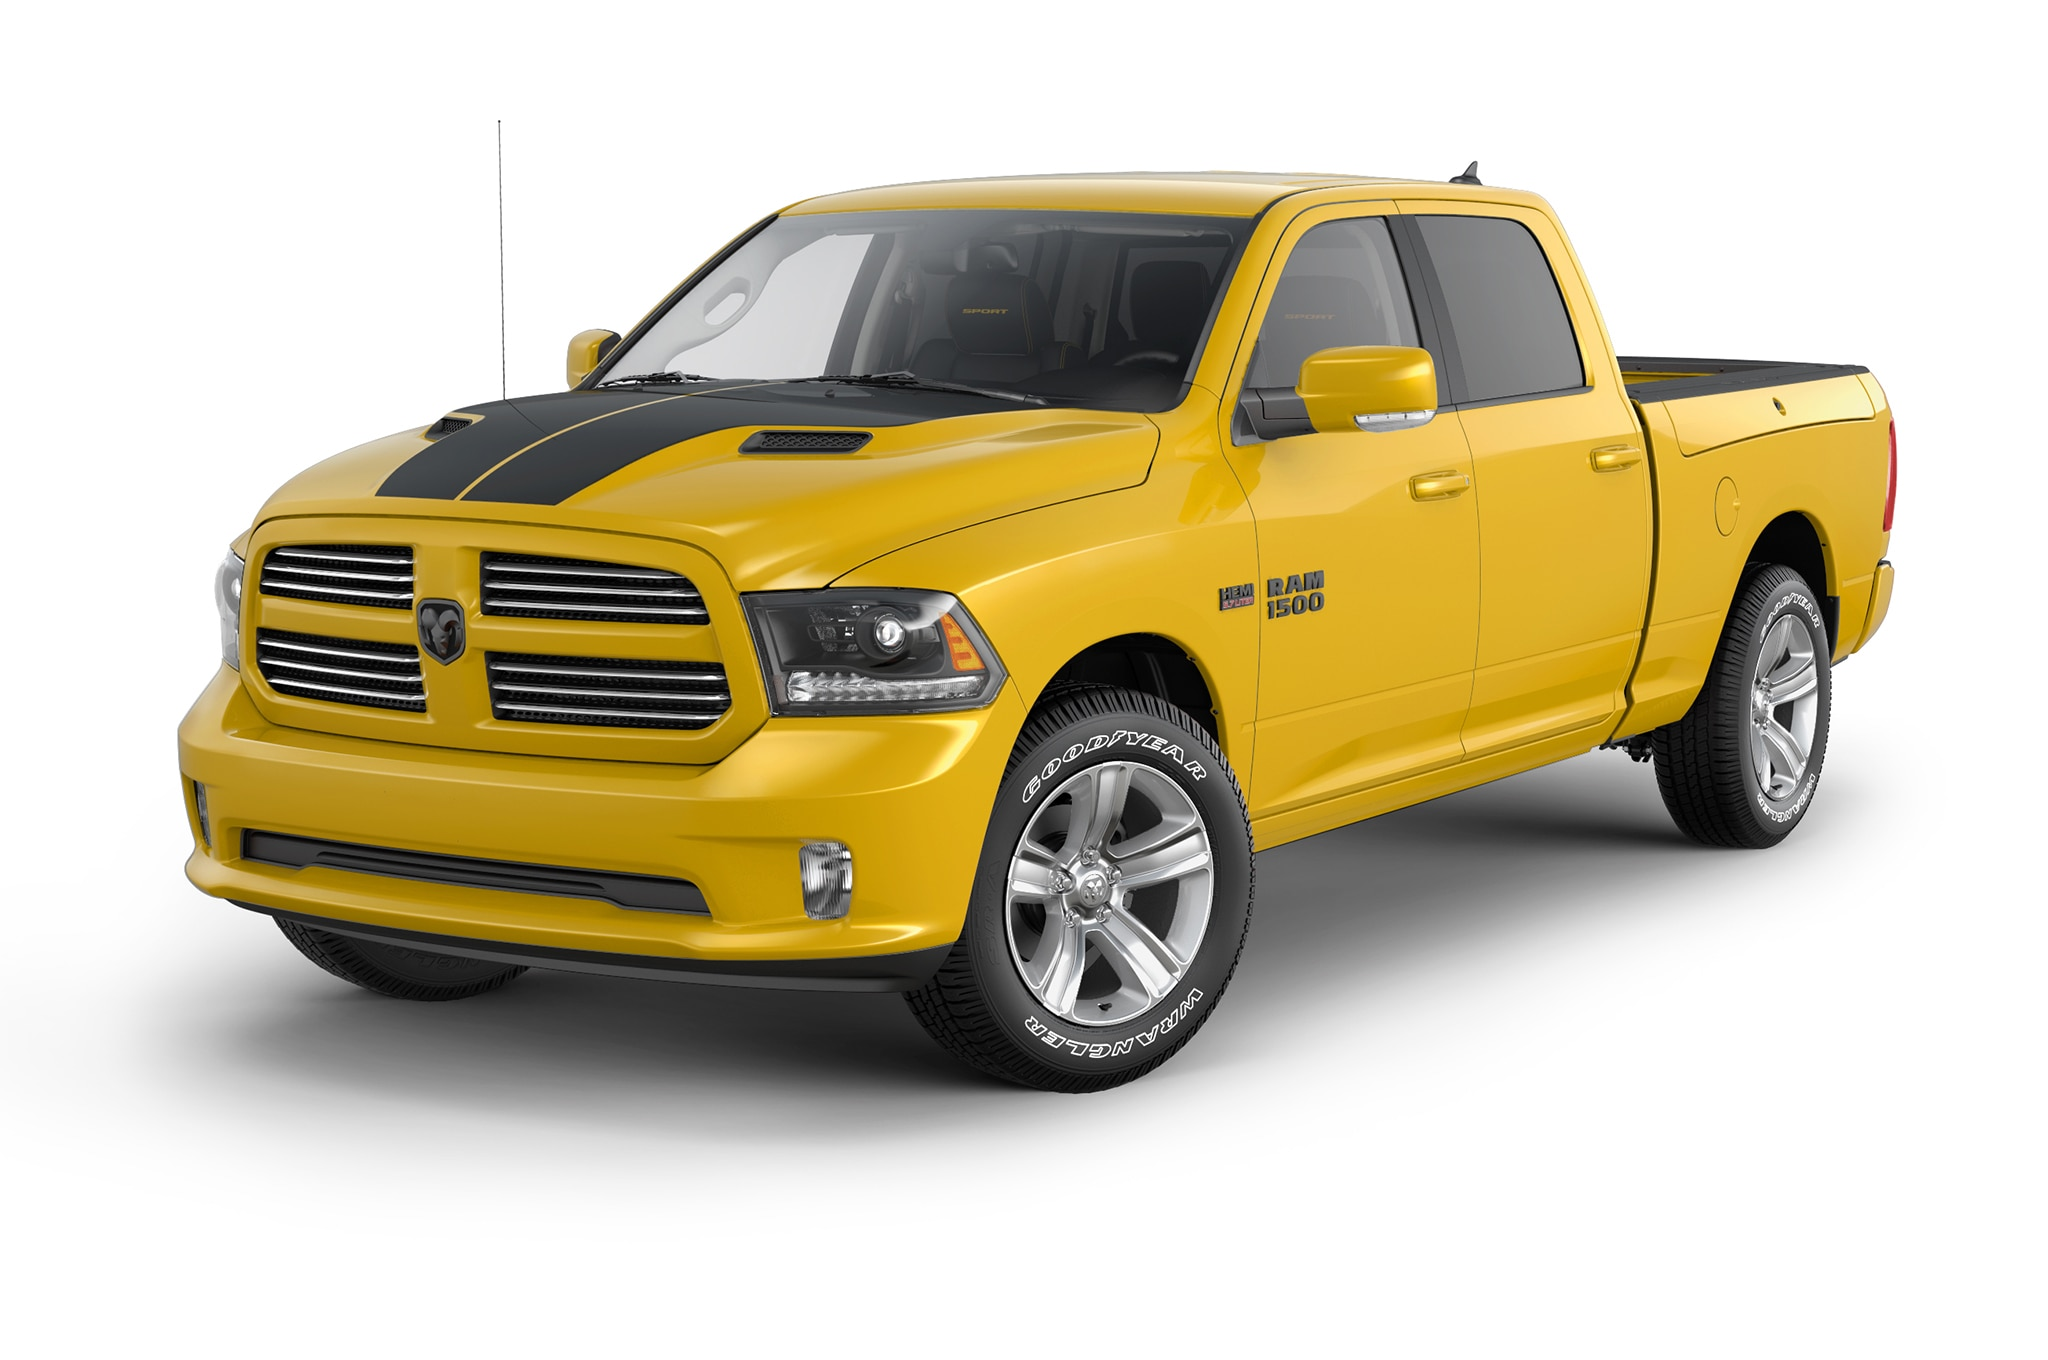 2016 ram 1500 stinger yellow sport unveiled. Black Bedroom Furniture Sets. Home Design Ideas